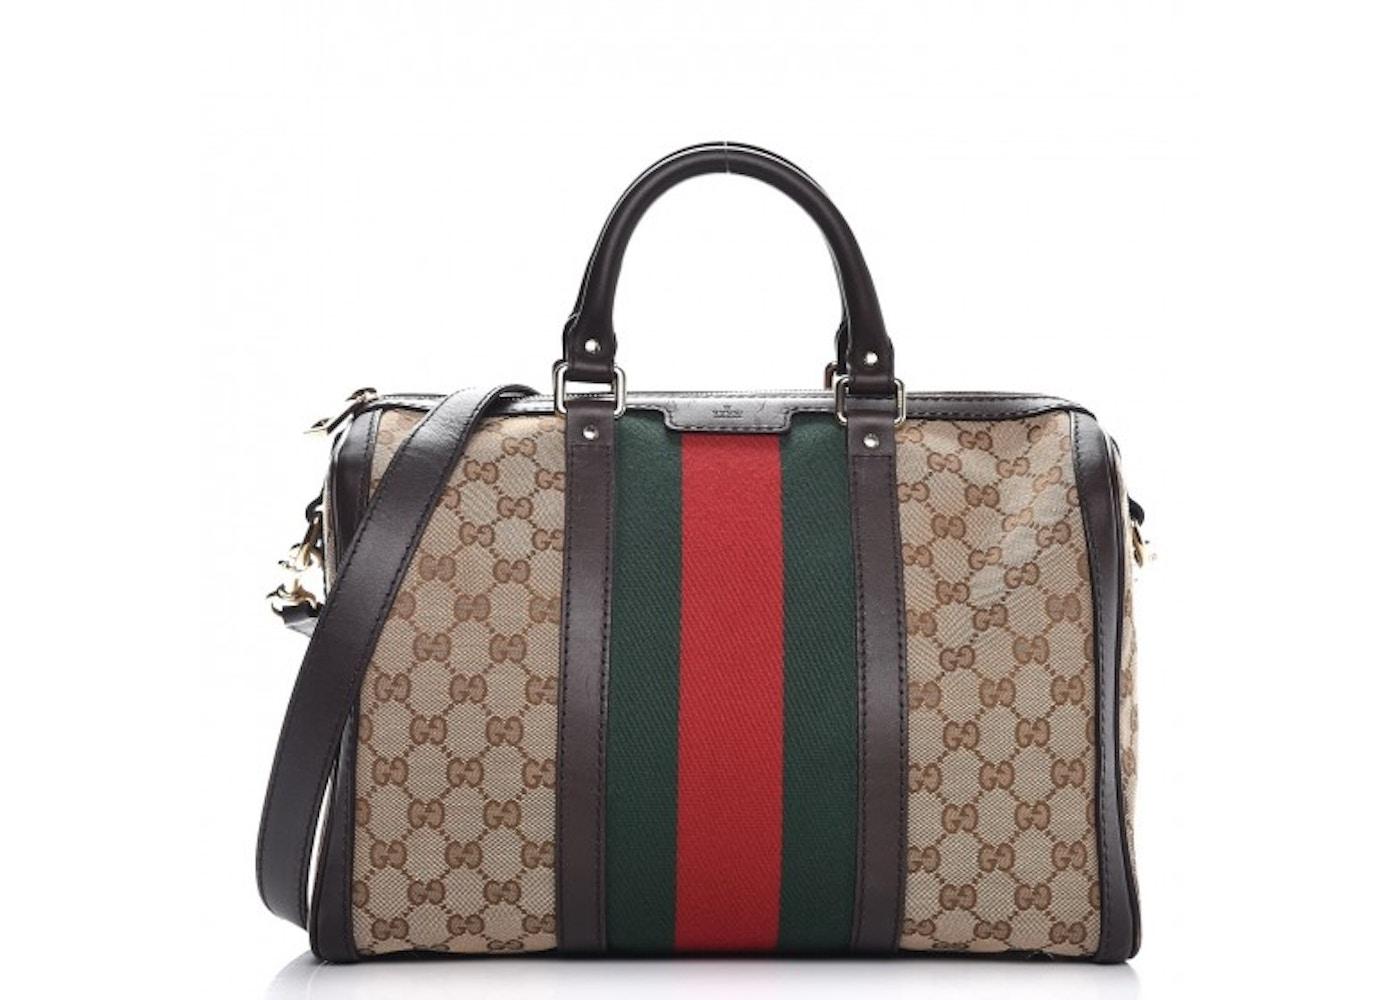 1ad0516f533 Buy   Sell Gucci Boston Handbags - New Highest Bids